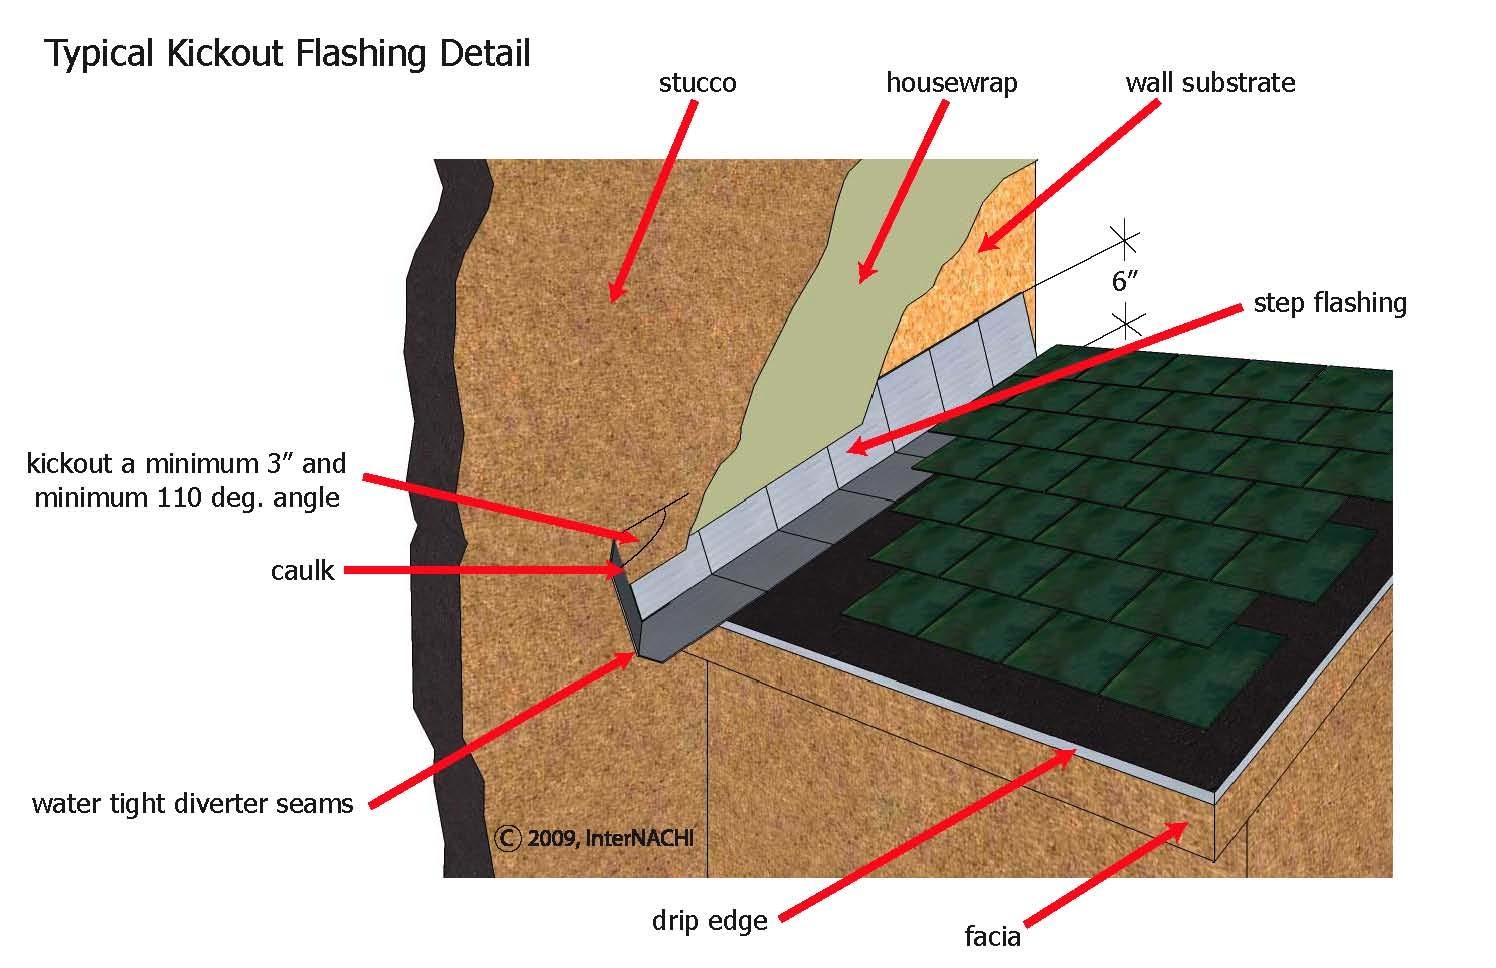 Kick-out flashing diagram